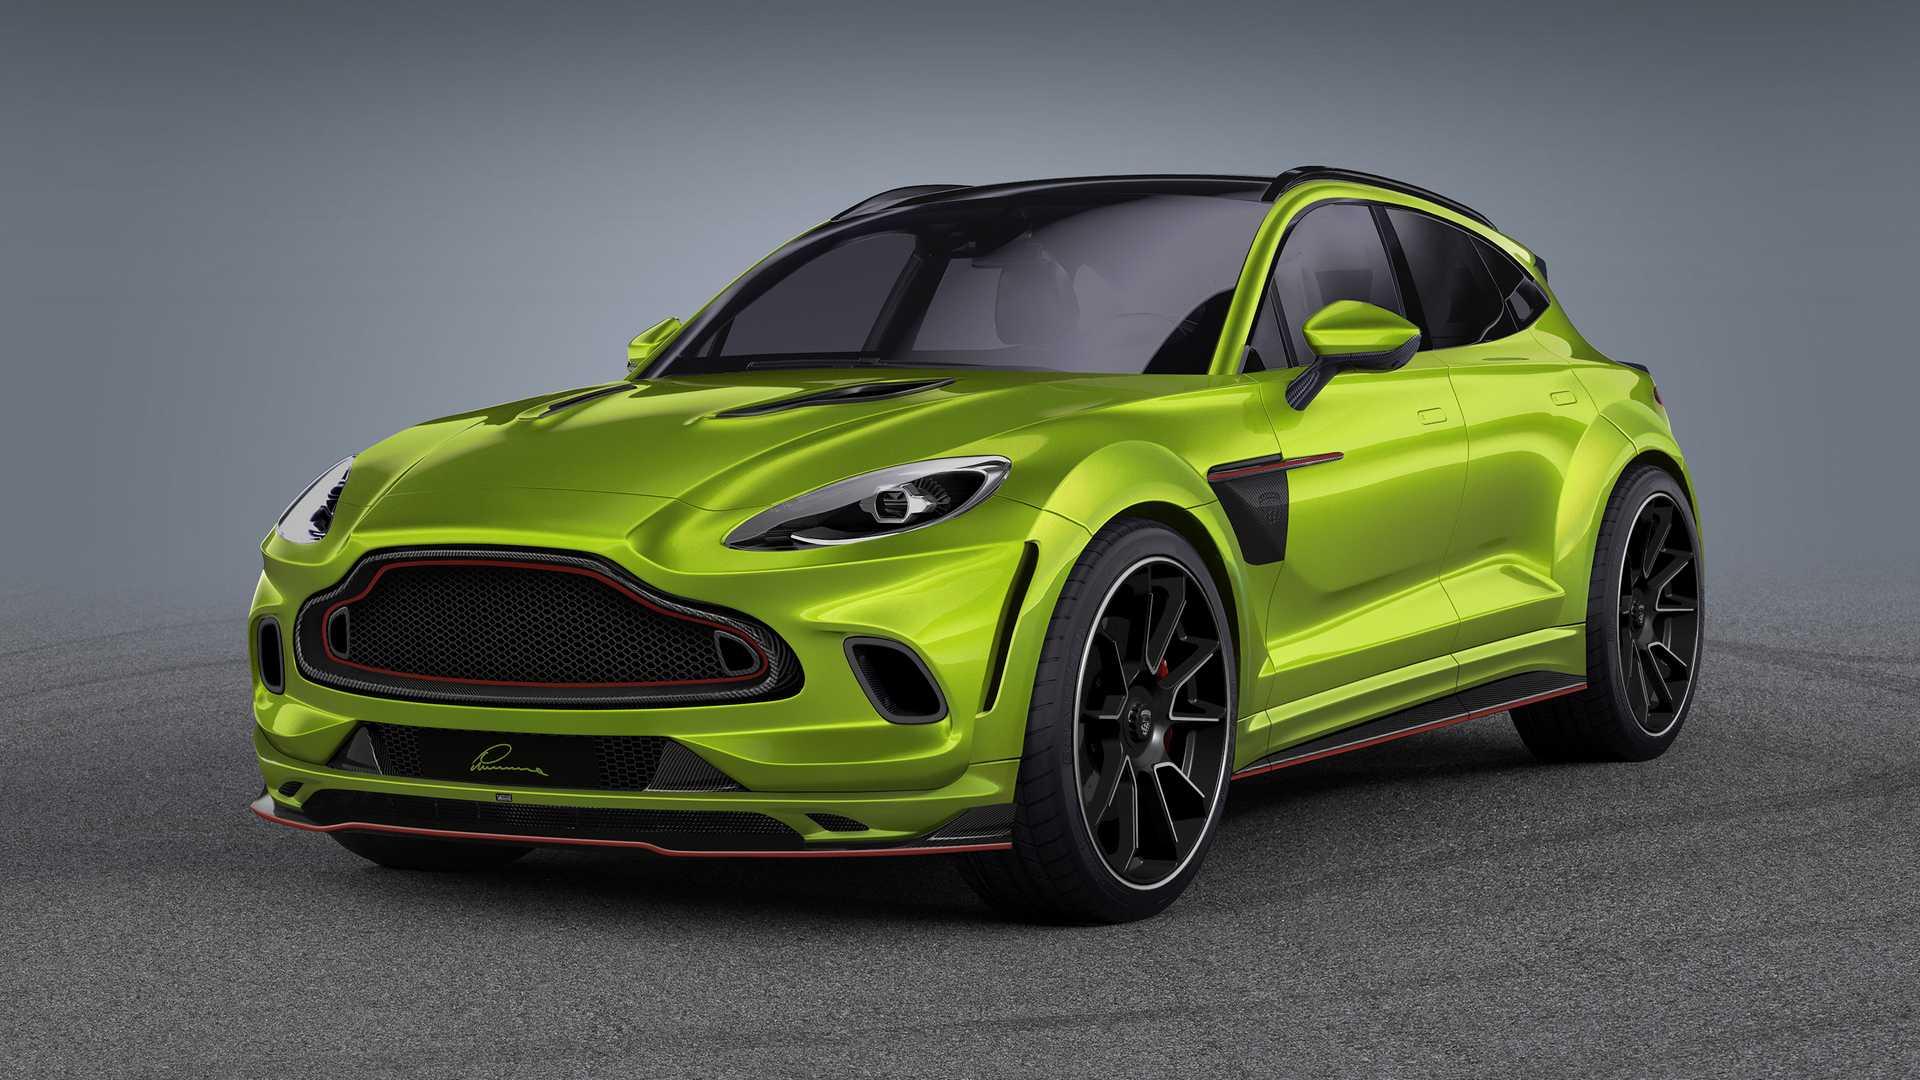 Aston Martin DBX Gets Carbon Fiber Dose By Lumma Design